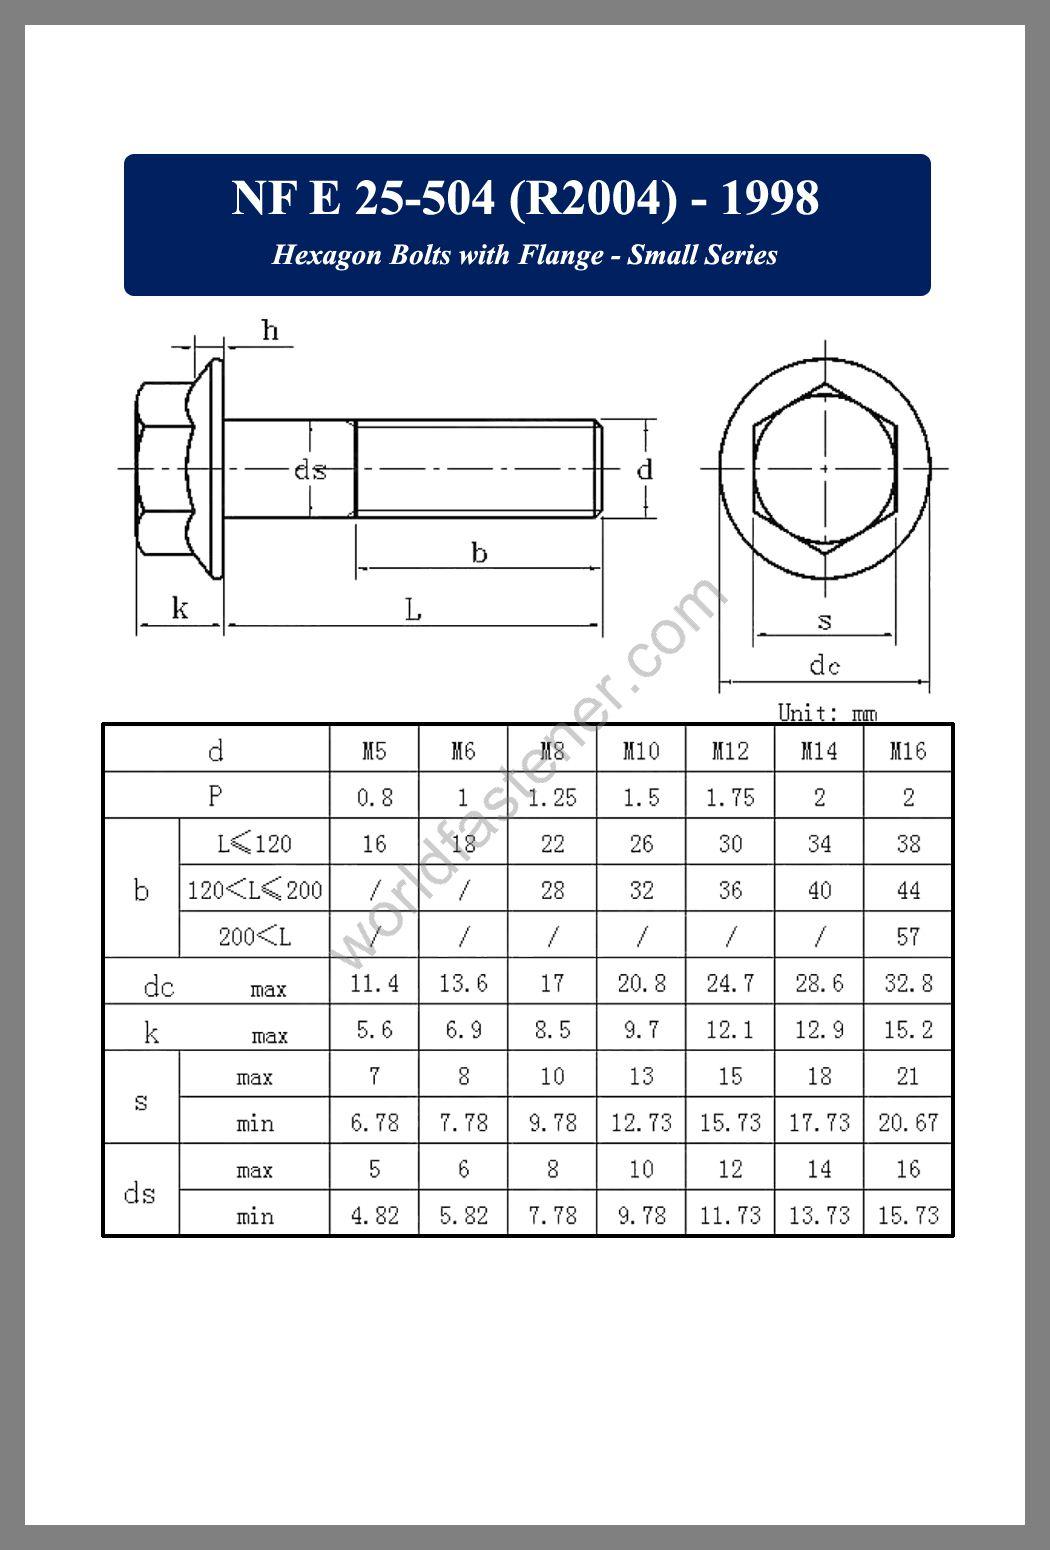 NF E25-504, NF E25-504 Flanged Bolts, NF E 25-504, Flange screws, fastener, screw, bolt, NF bolts